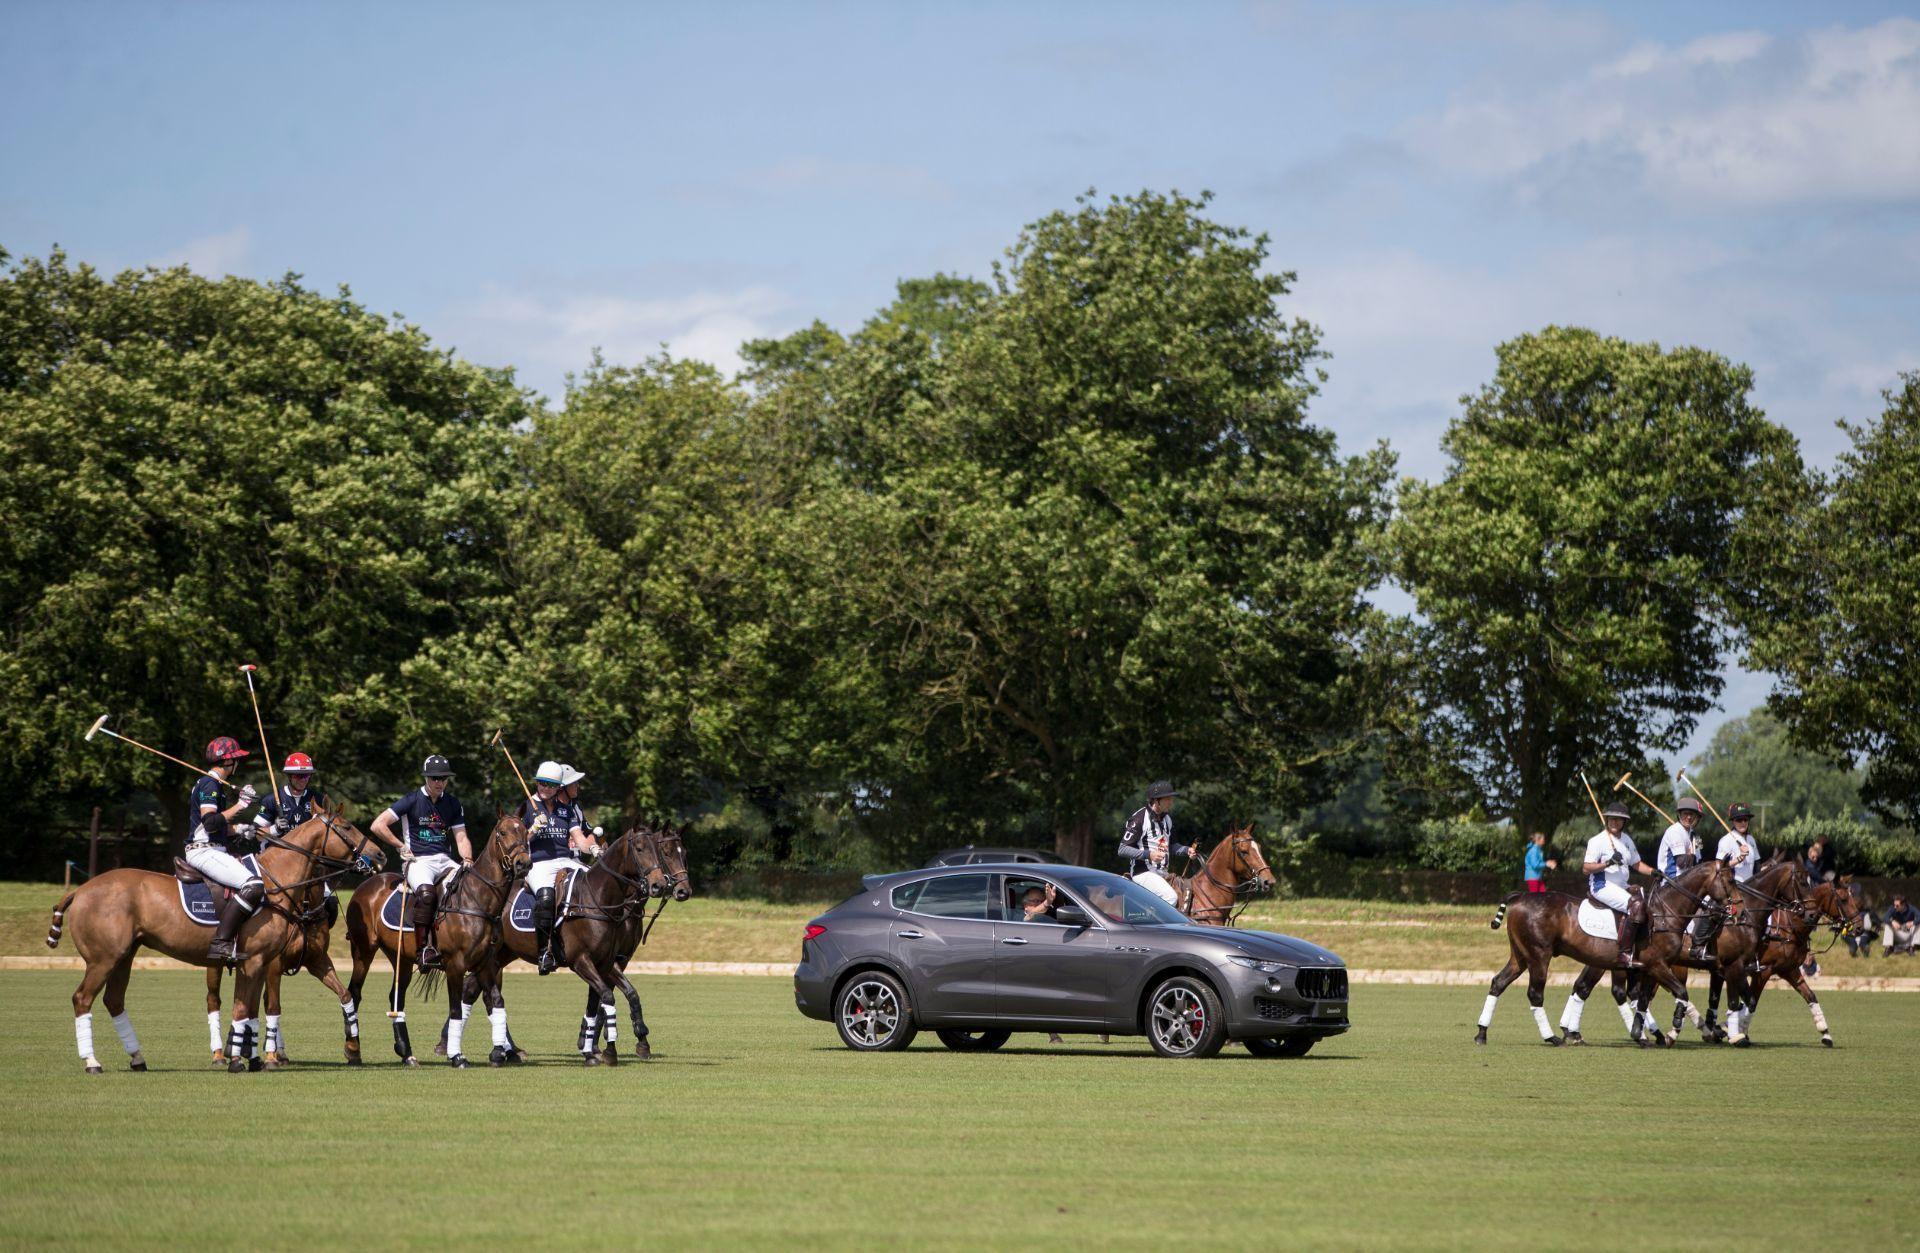 Maserati Royal Charity Polo Trophy: la etapa británica del tour de polo internacional firmado por Maserati y La Martina